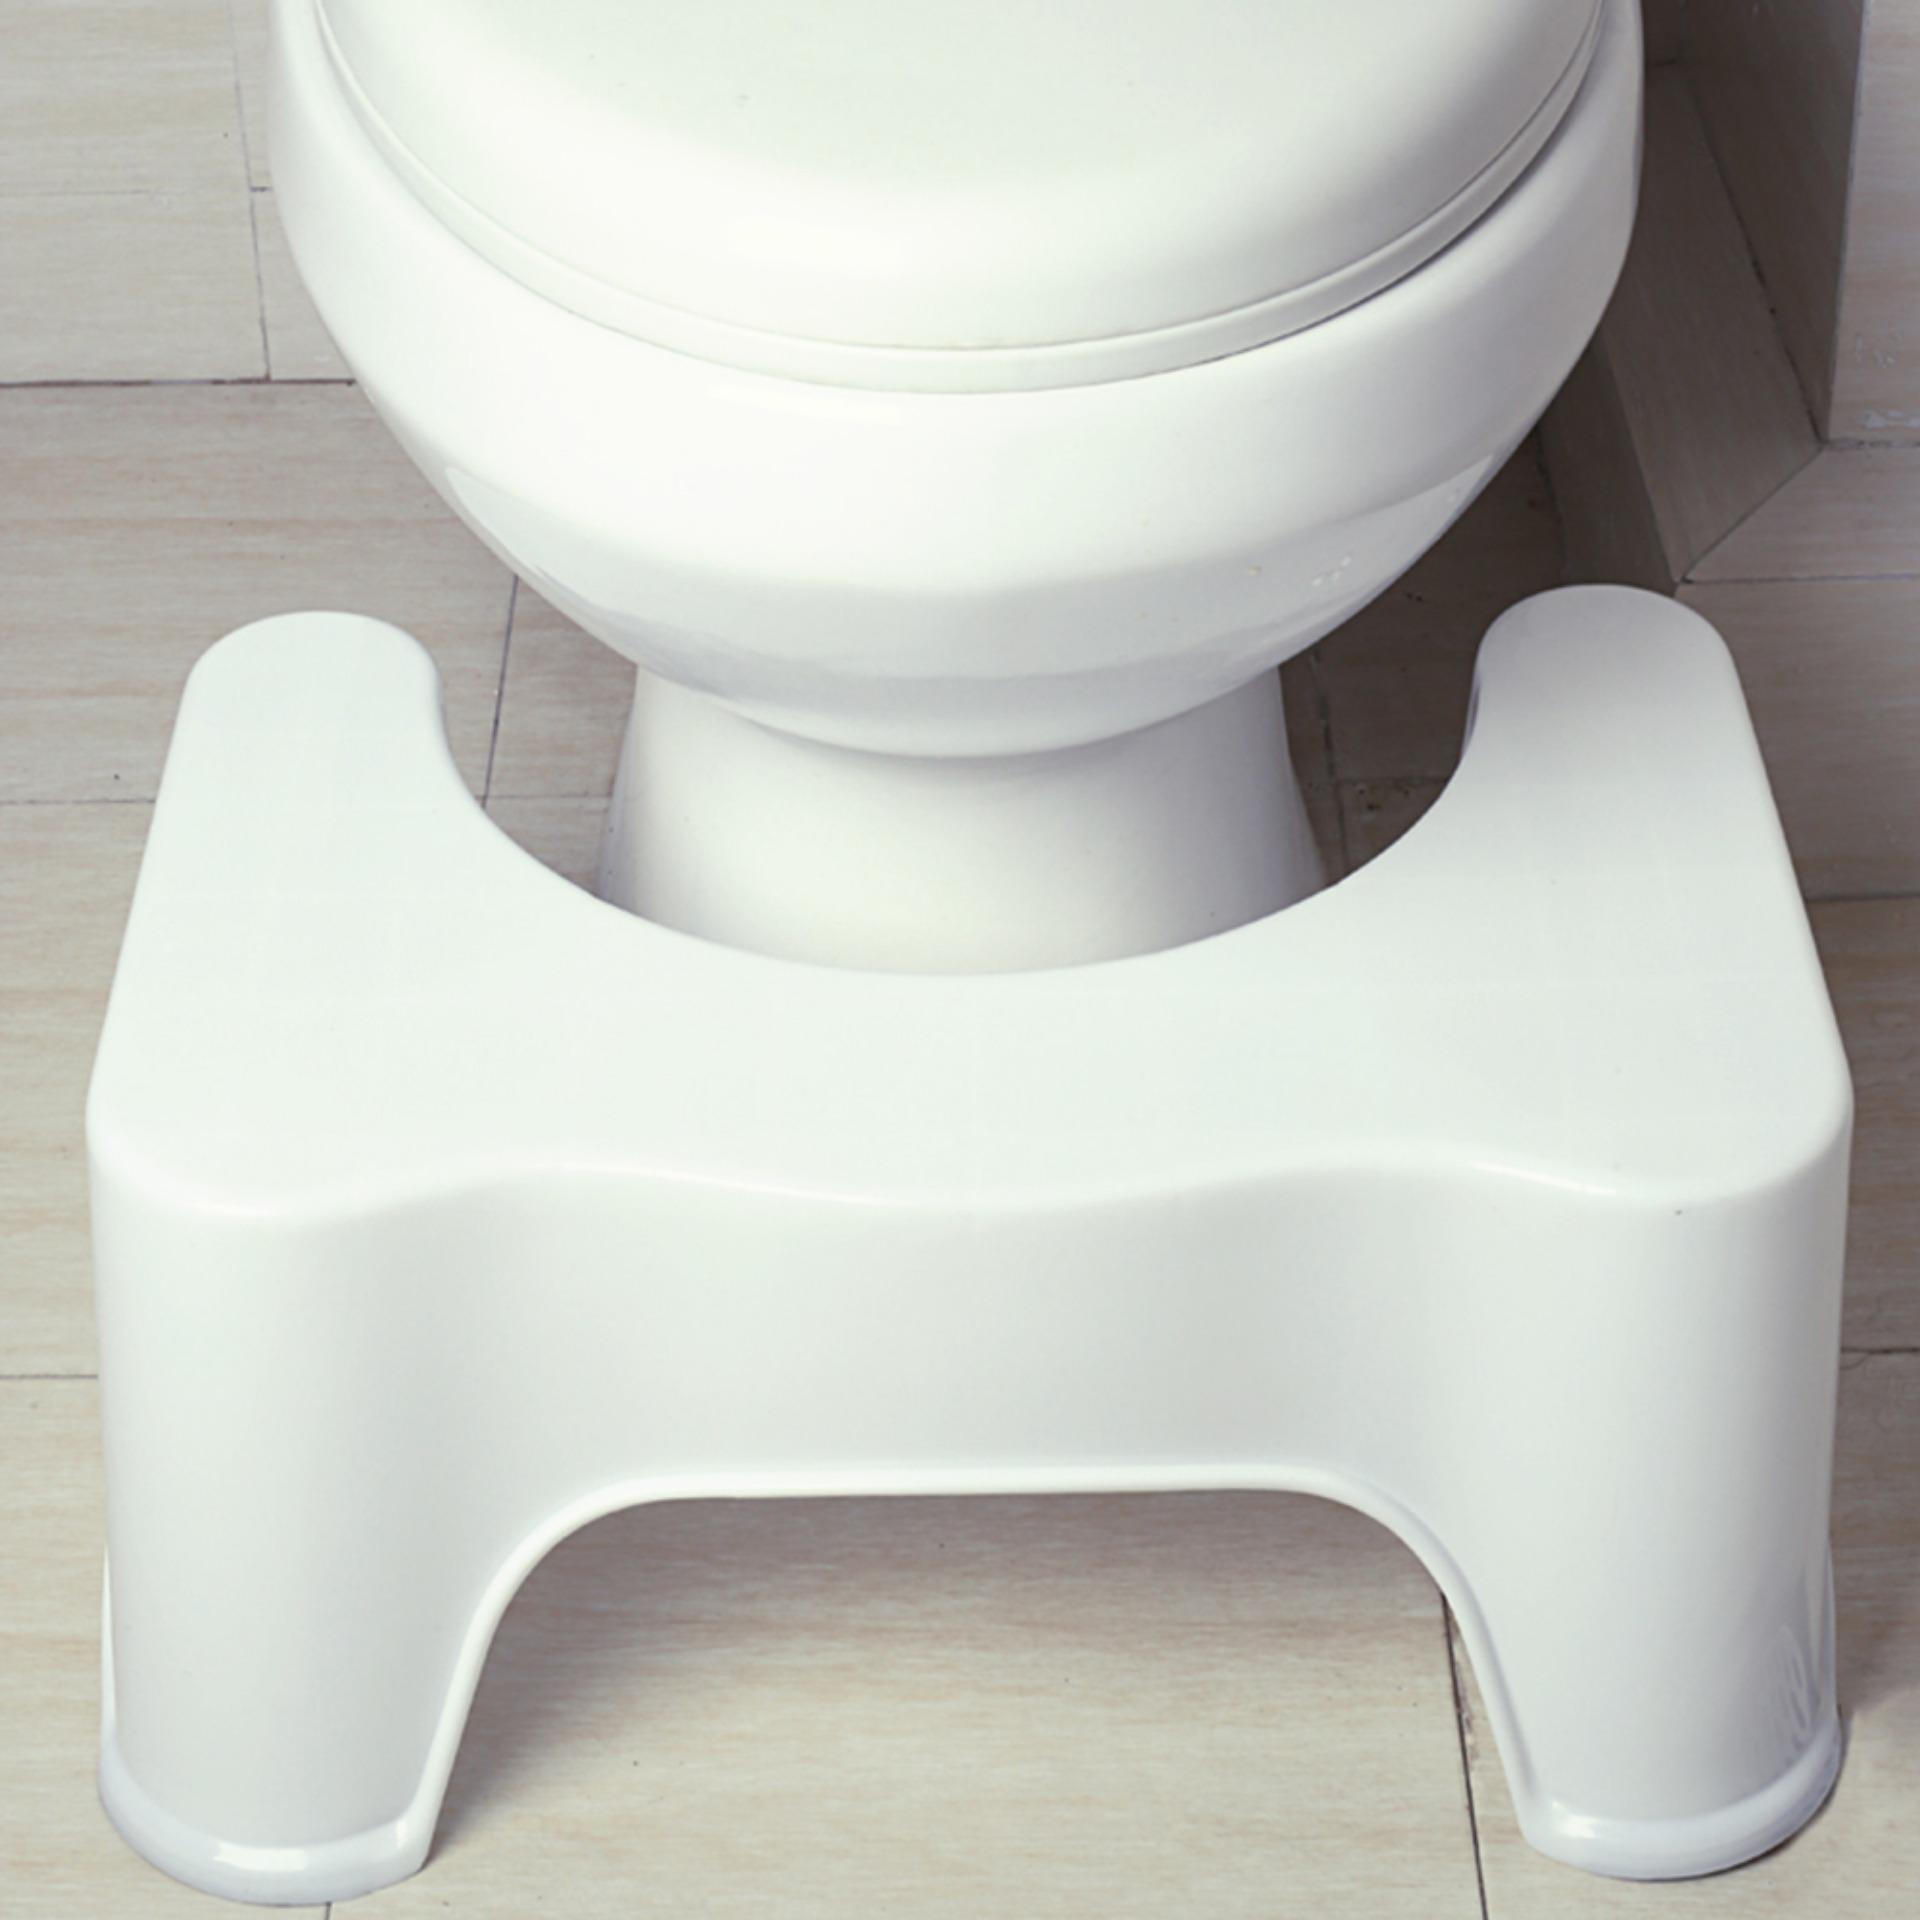 Feng Sheng Health Bathroom Toilet Stool Squatty Step Stool Bathroom Potty Squat Aid For Constipation Piles Relief White - intl | Lazada PH & Feng Sheng Health Bathroom Toilet Stool Squatty Step Stool ... islam-shia.org